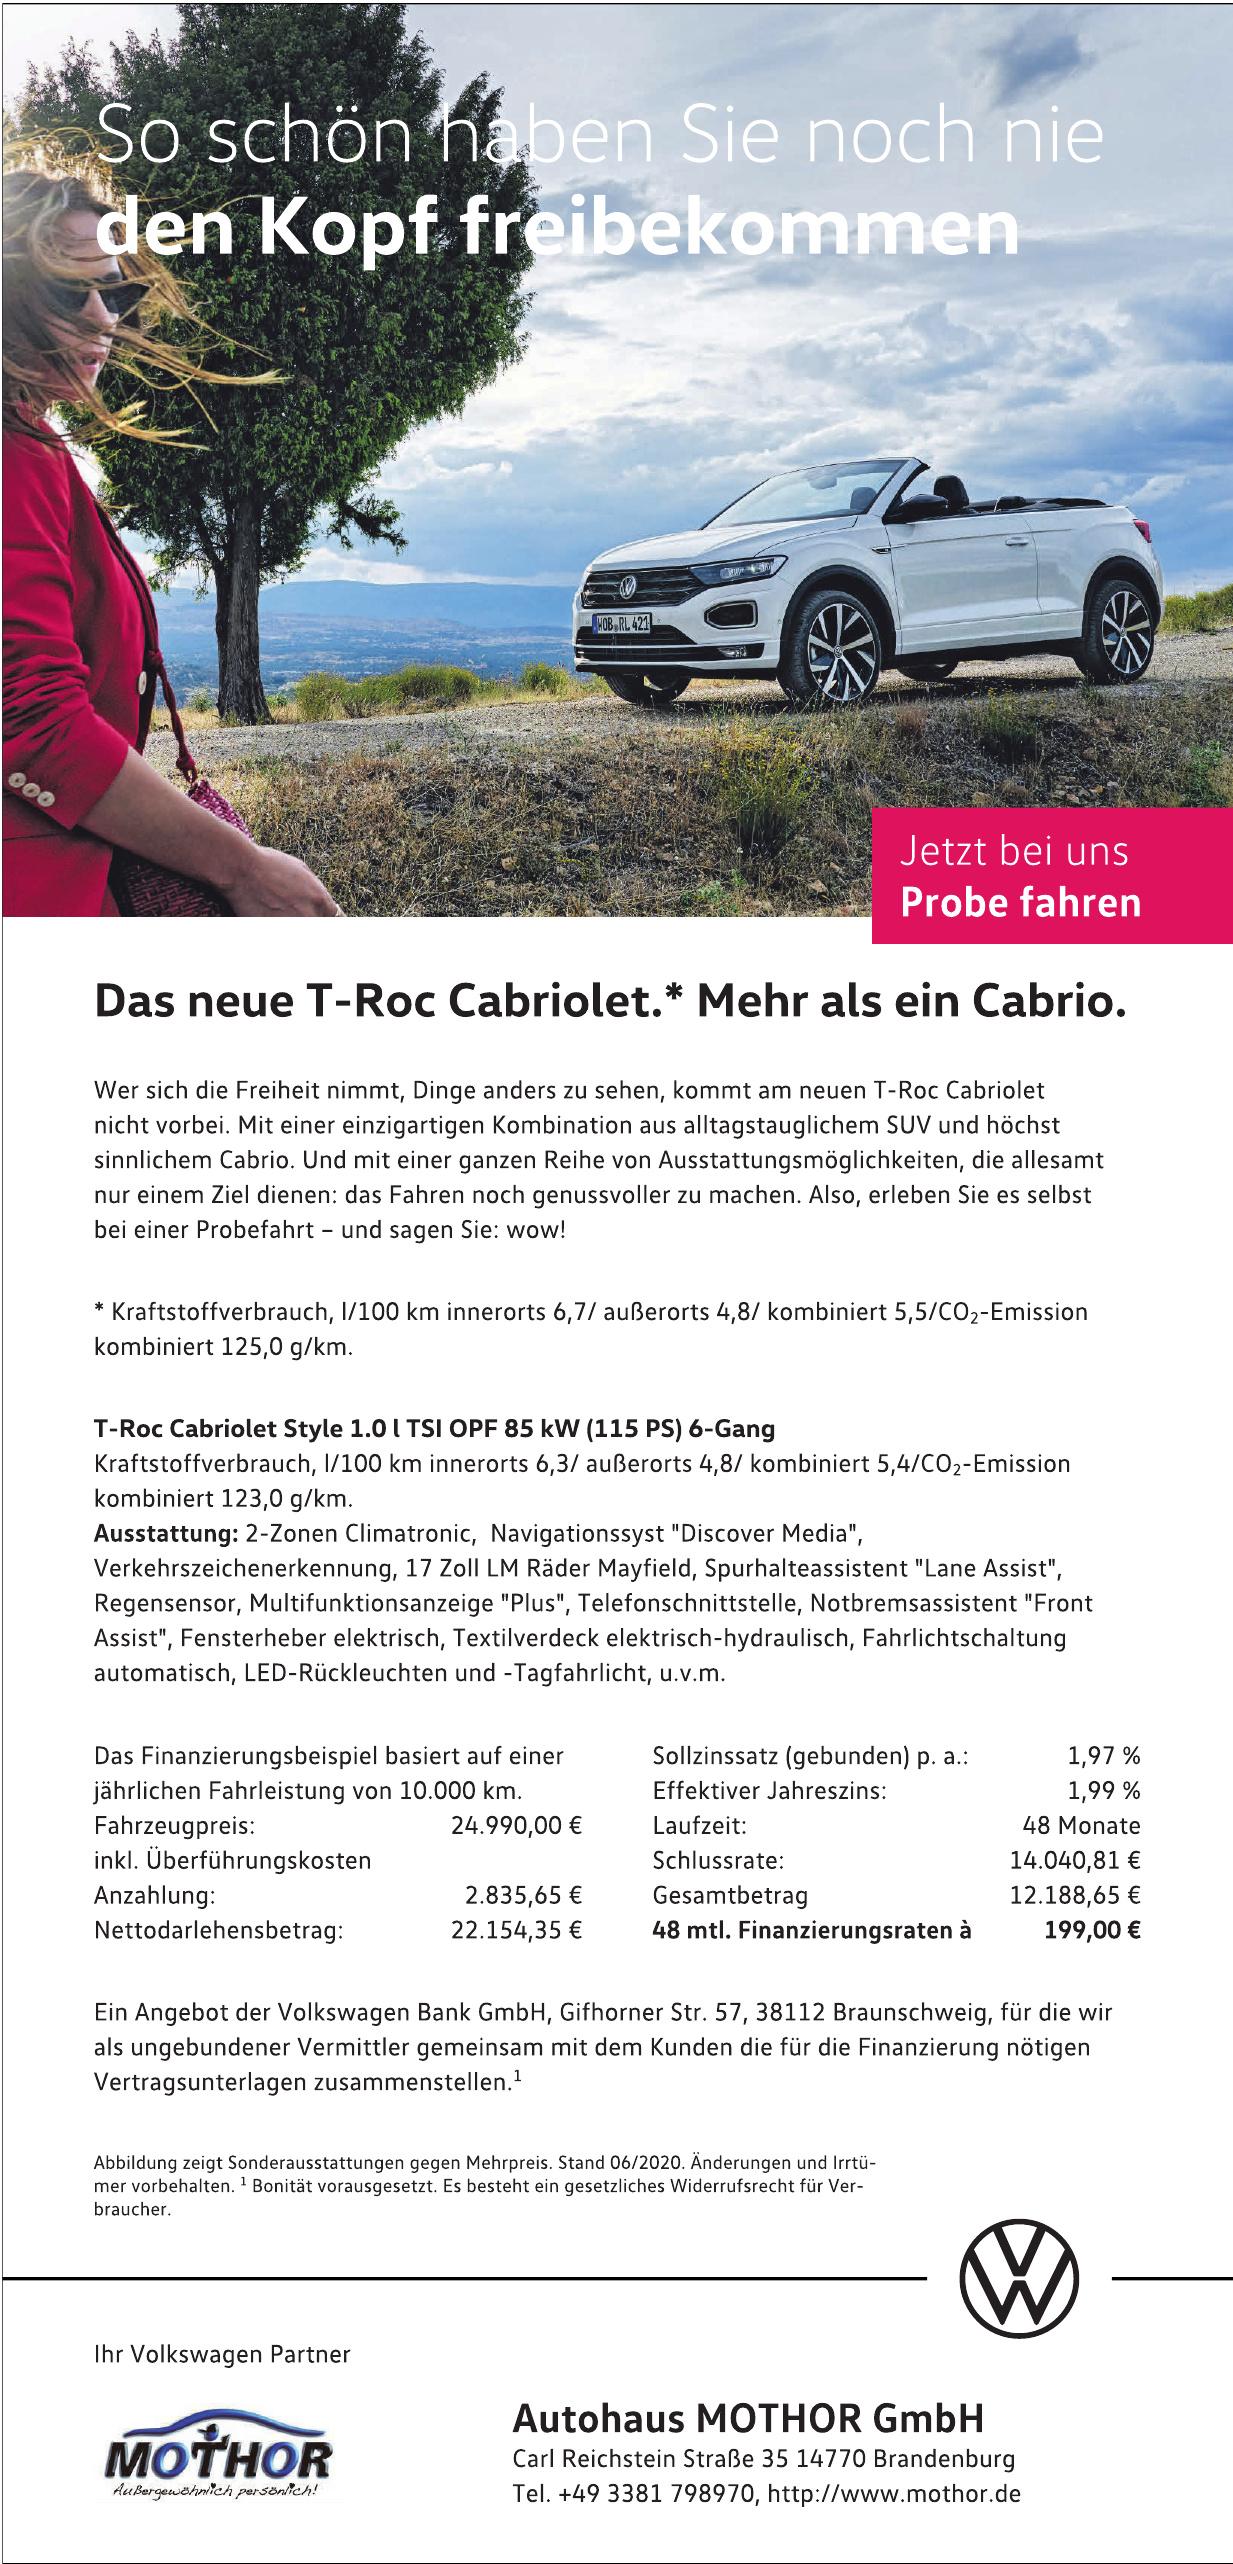 Autohaus Mothor GmbH